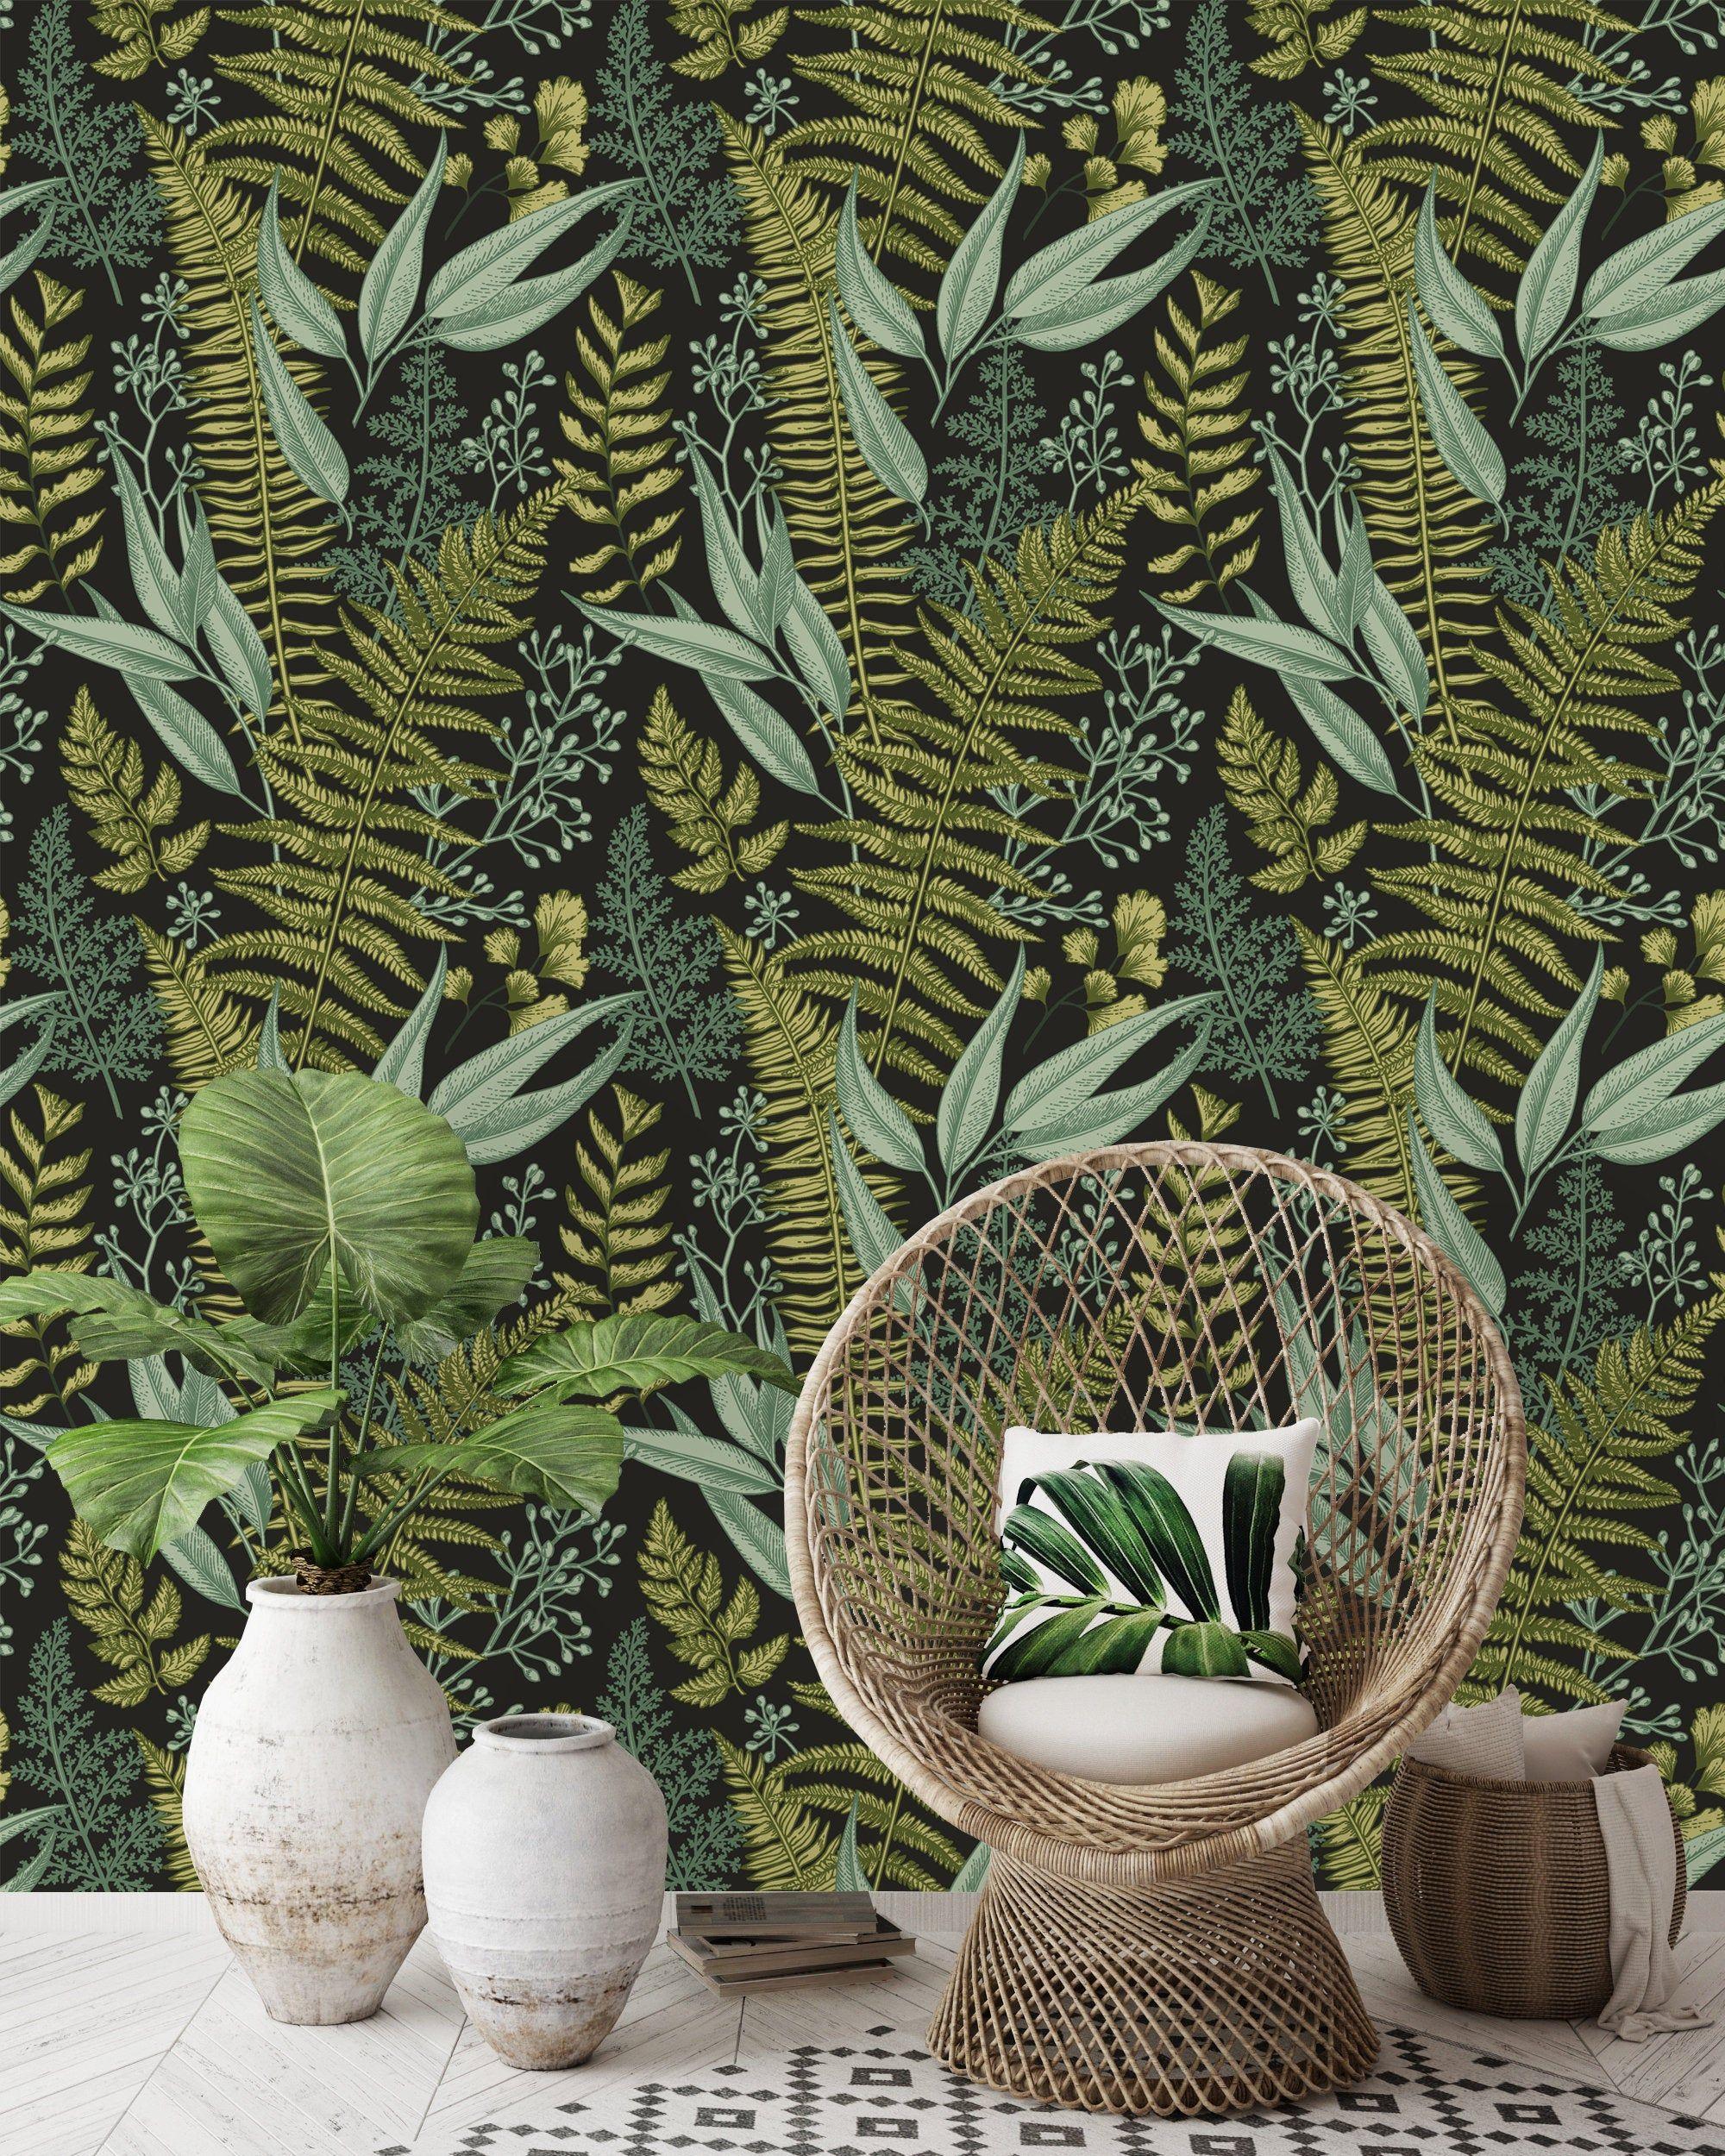 Removable Wallpaper Self Adhesive Wallpaper Dark Ferns Peel Self Adhesive Wallpaper Removable Wallpaper Fern Wallpaper